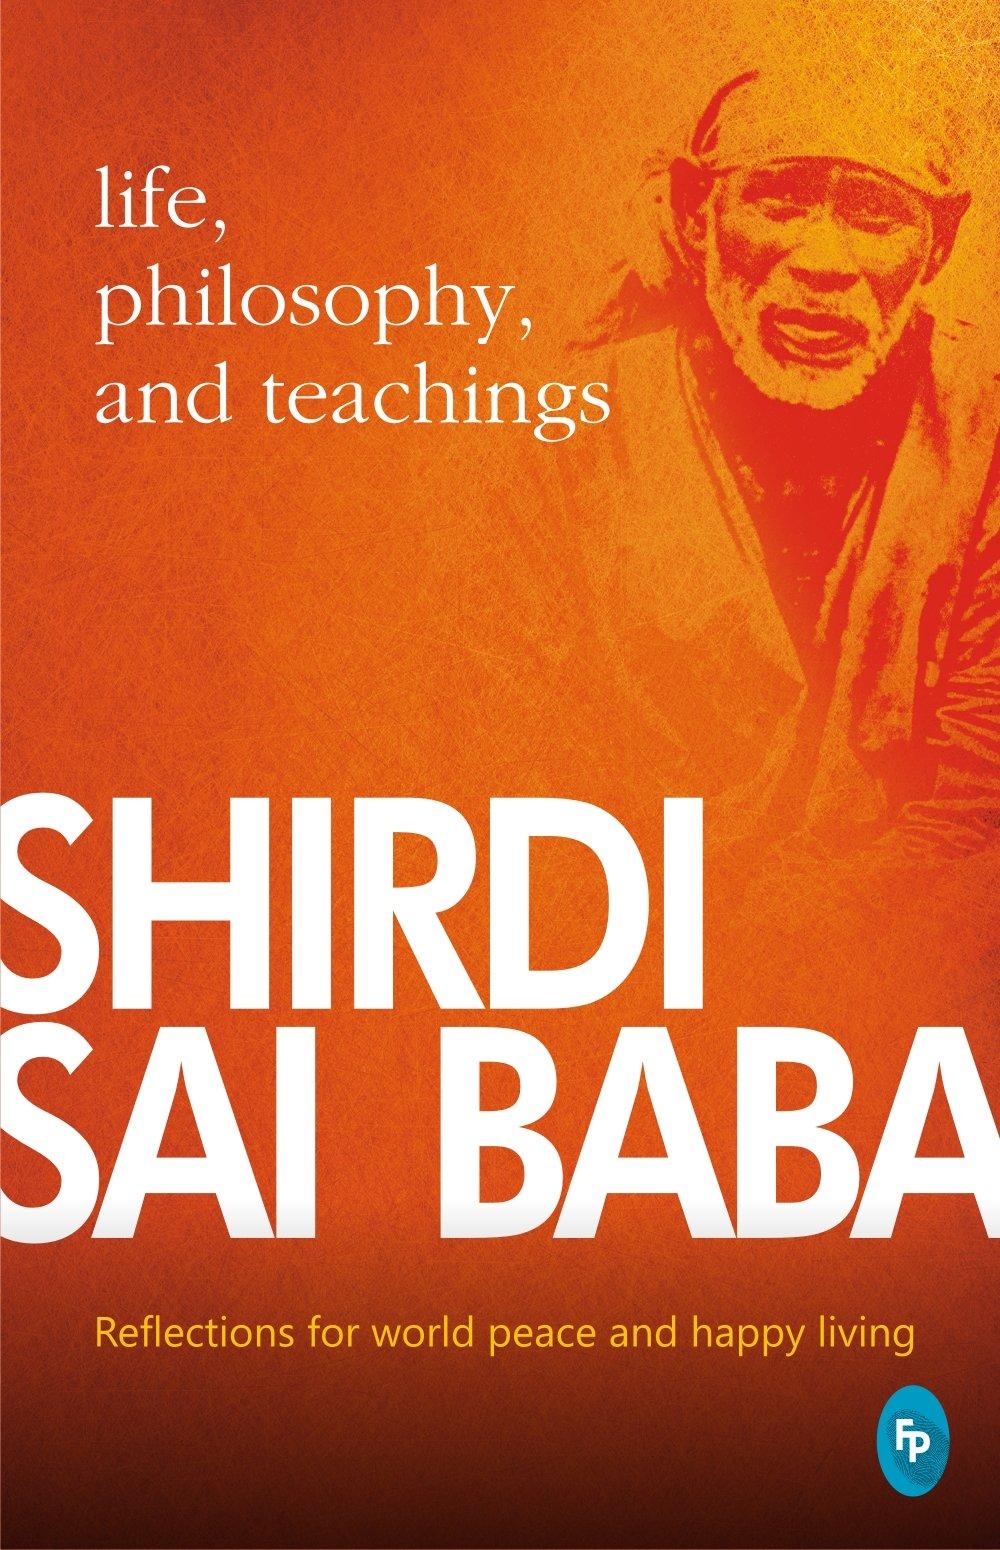 Buy Shirdi Sai Baba: Life, Philosophy & Teachings Book